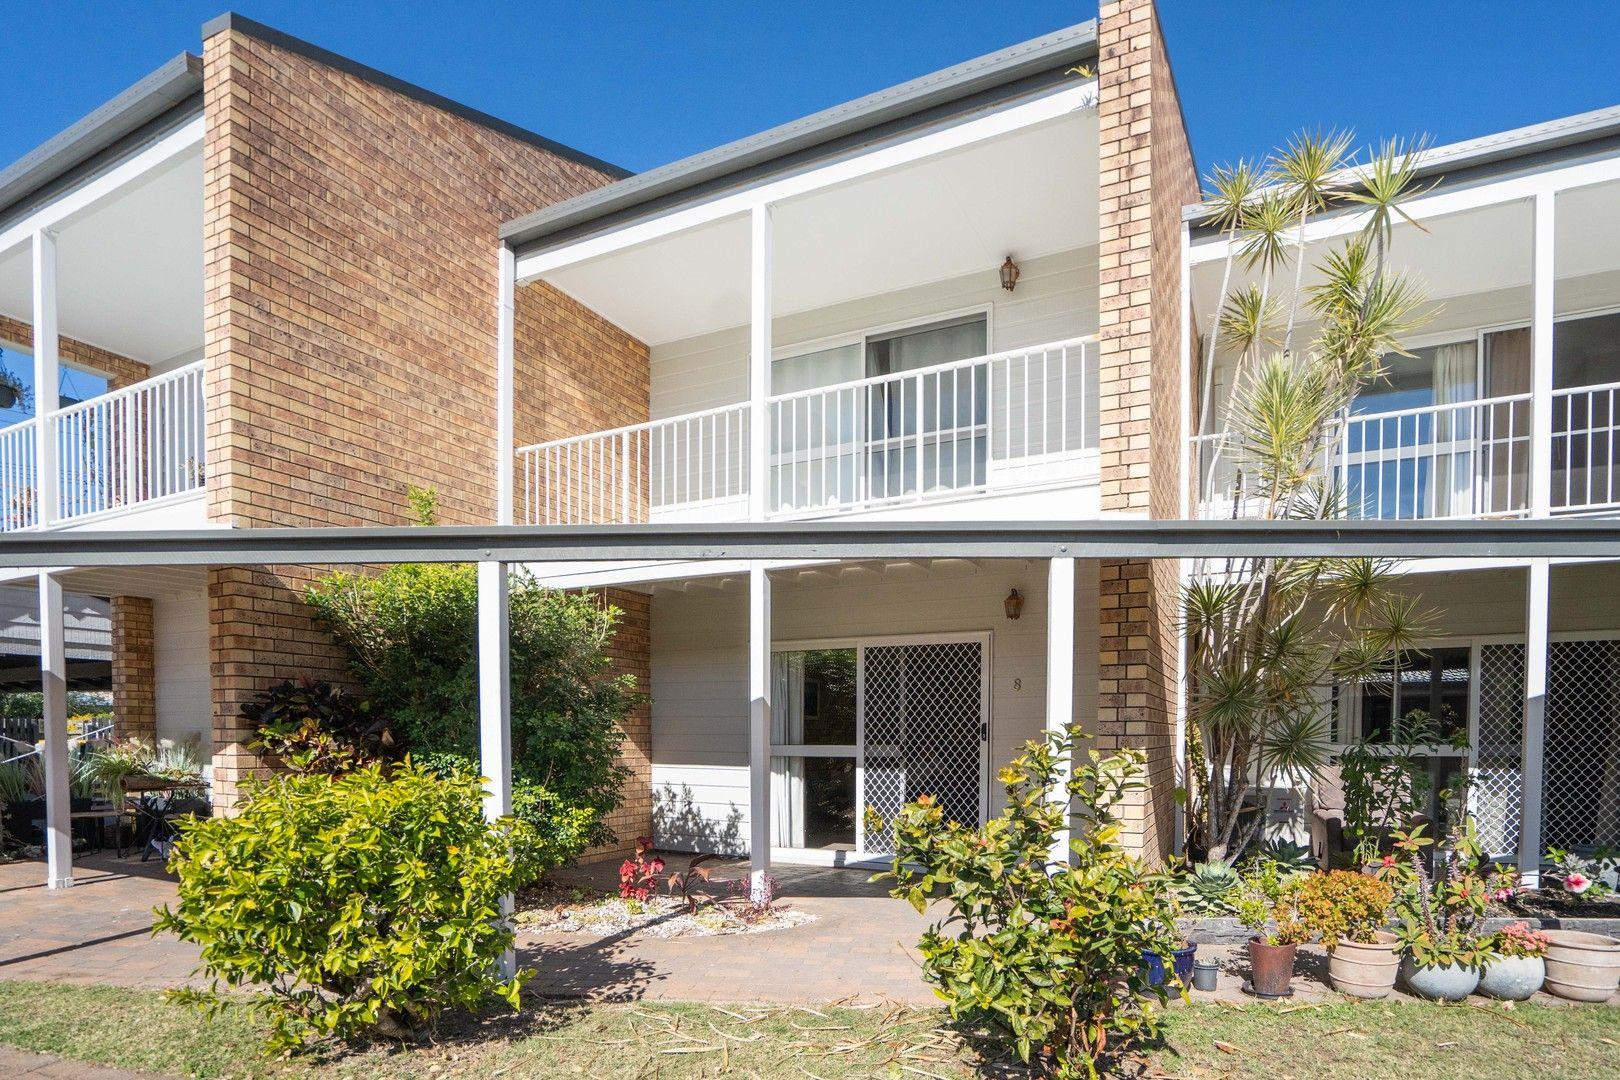 8/99 Cypress Street, Torquay QLD 4655, Image 0